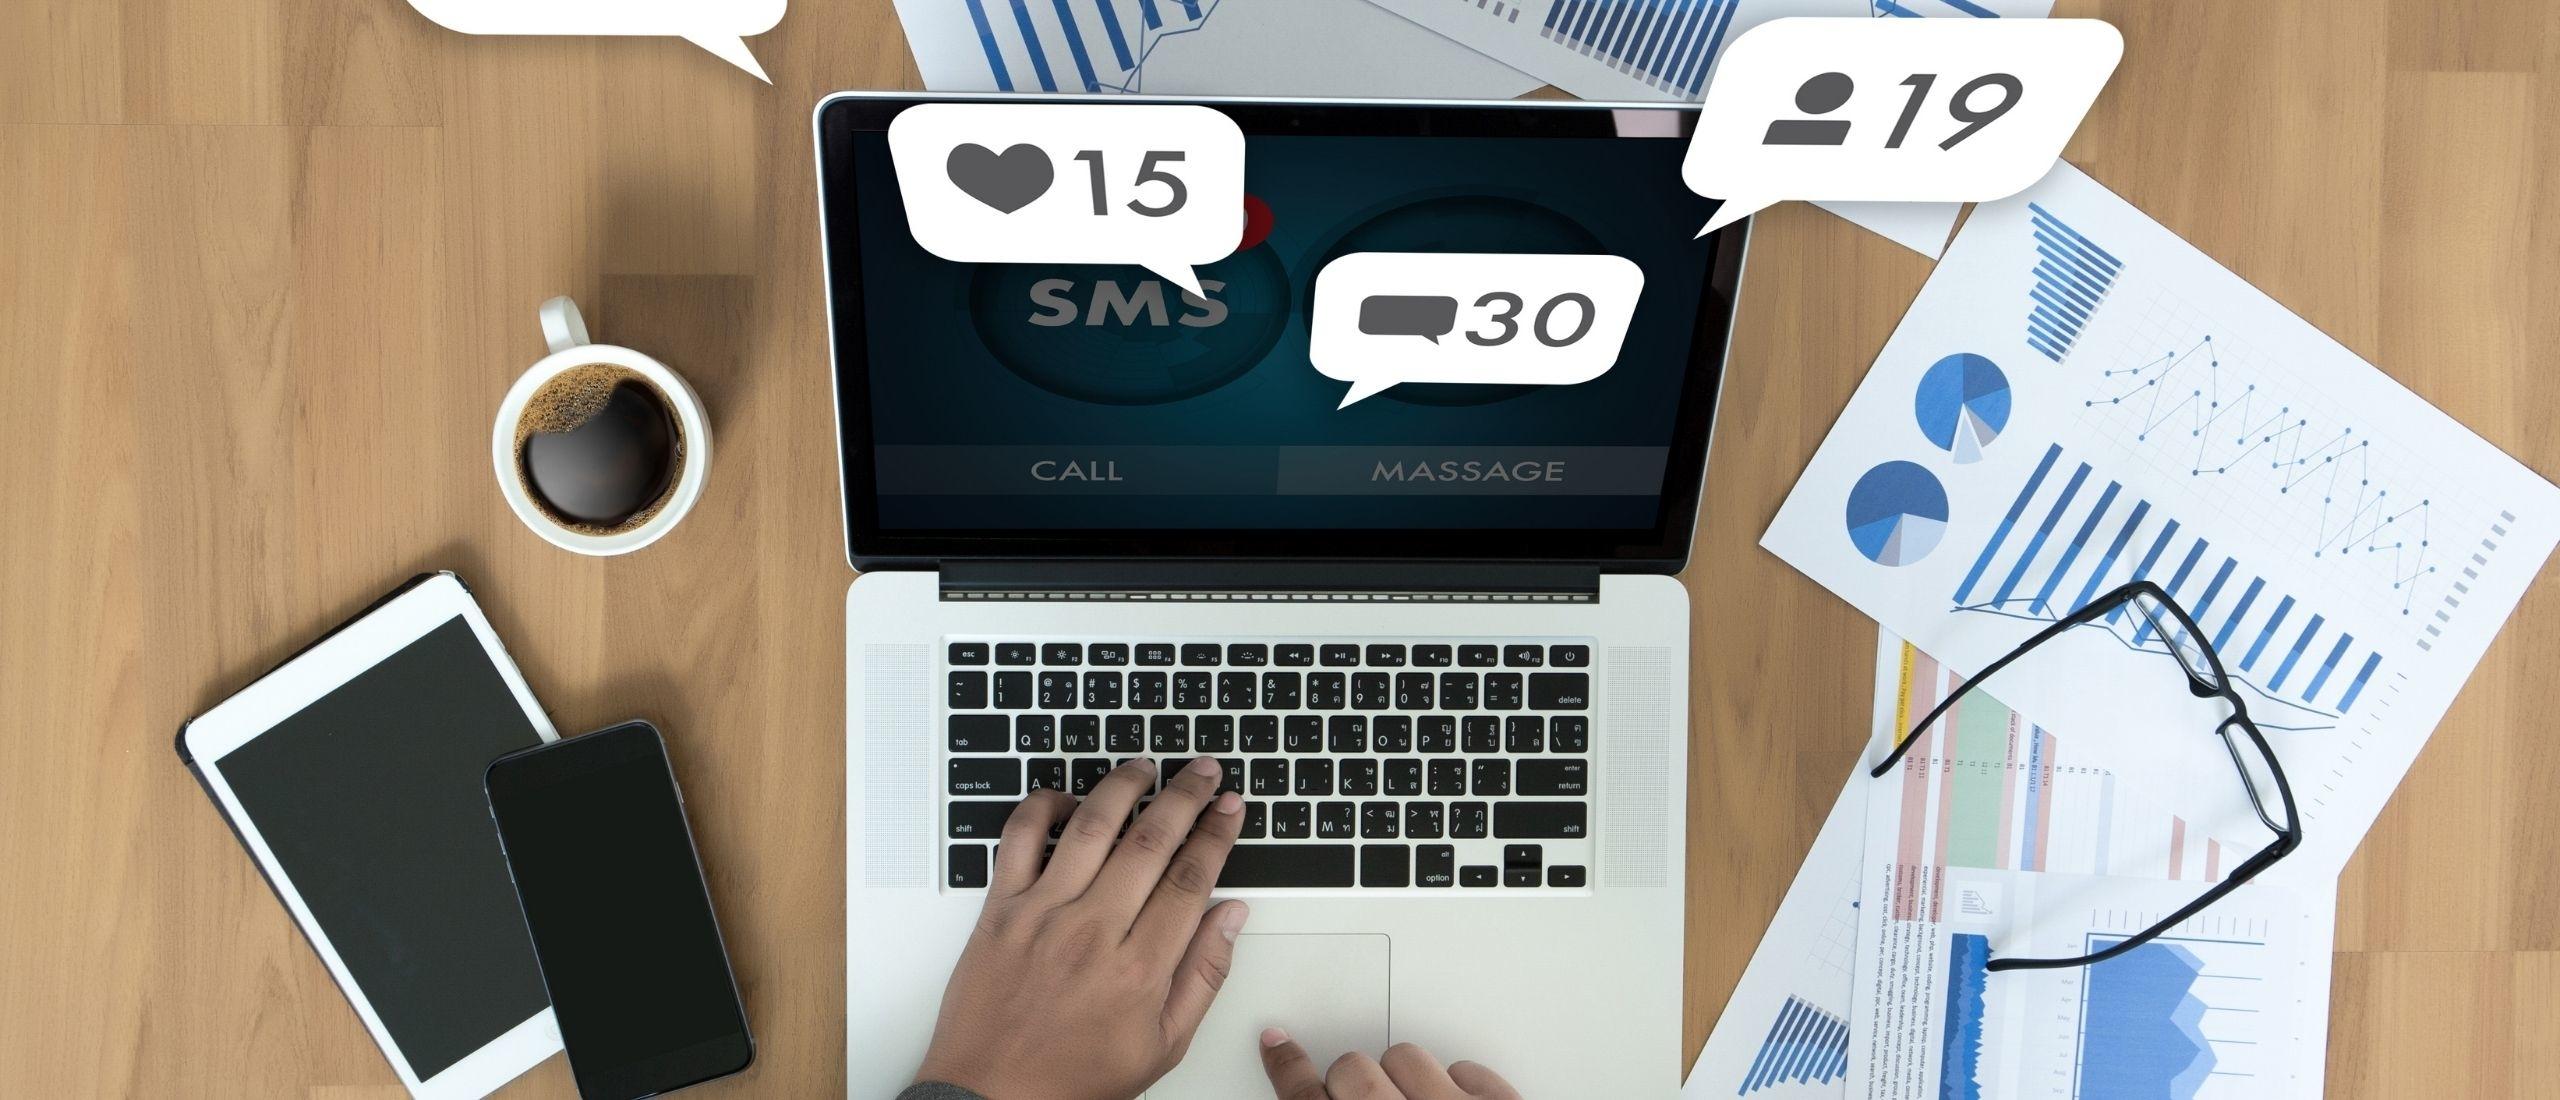 Waarom starten met Social media?